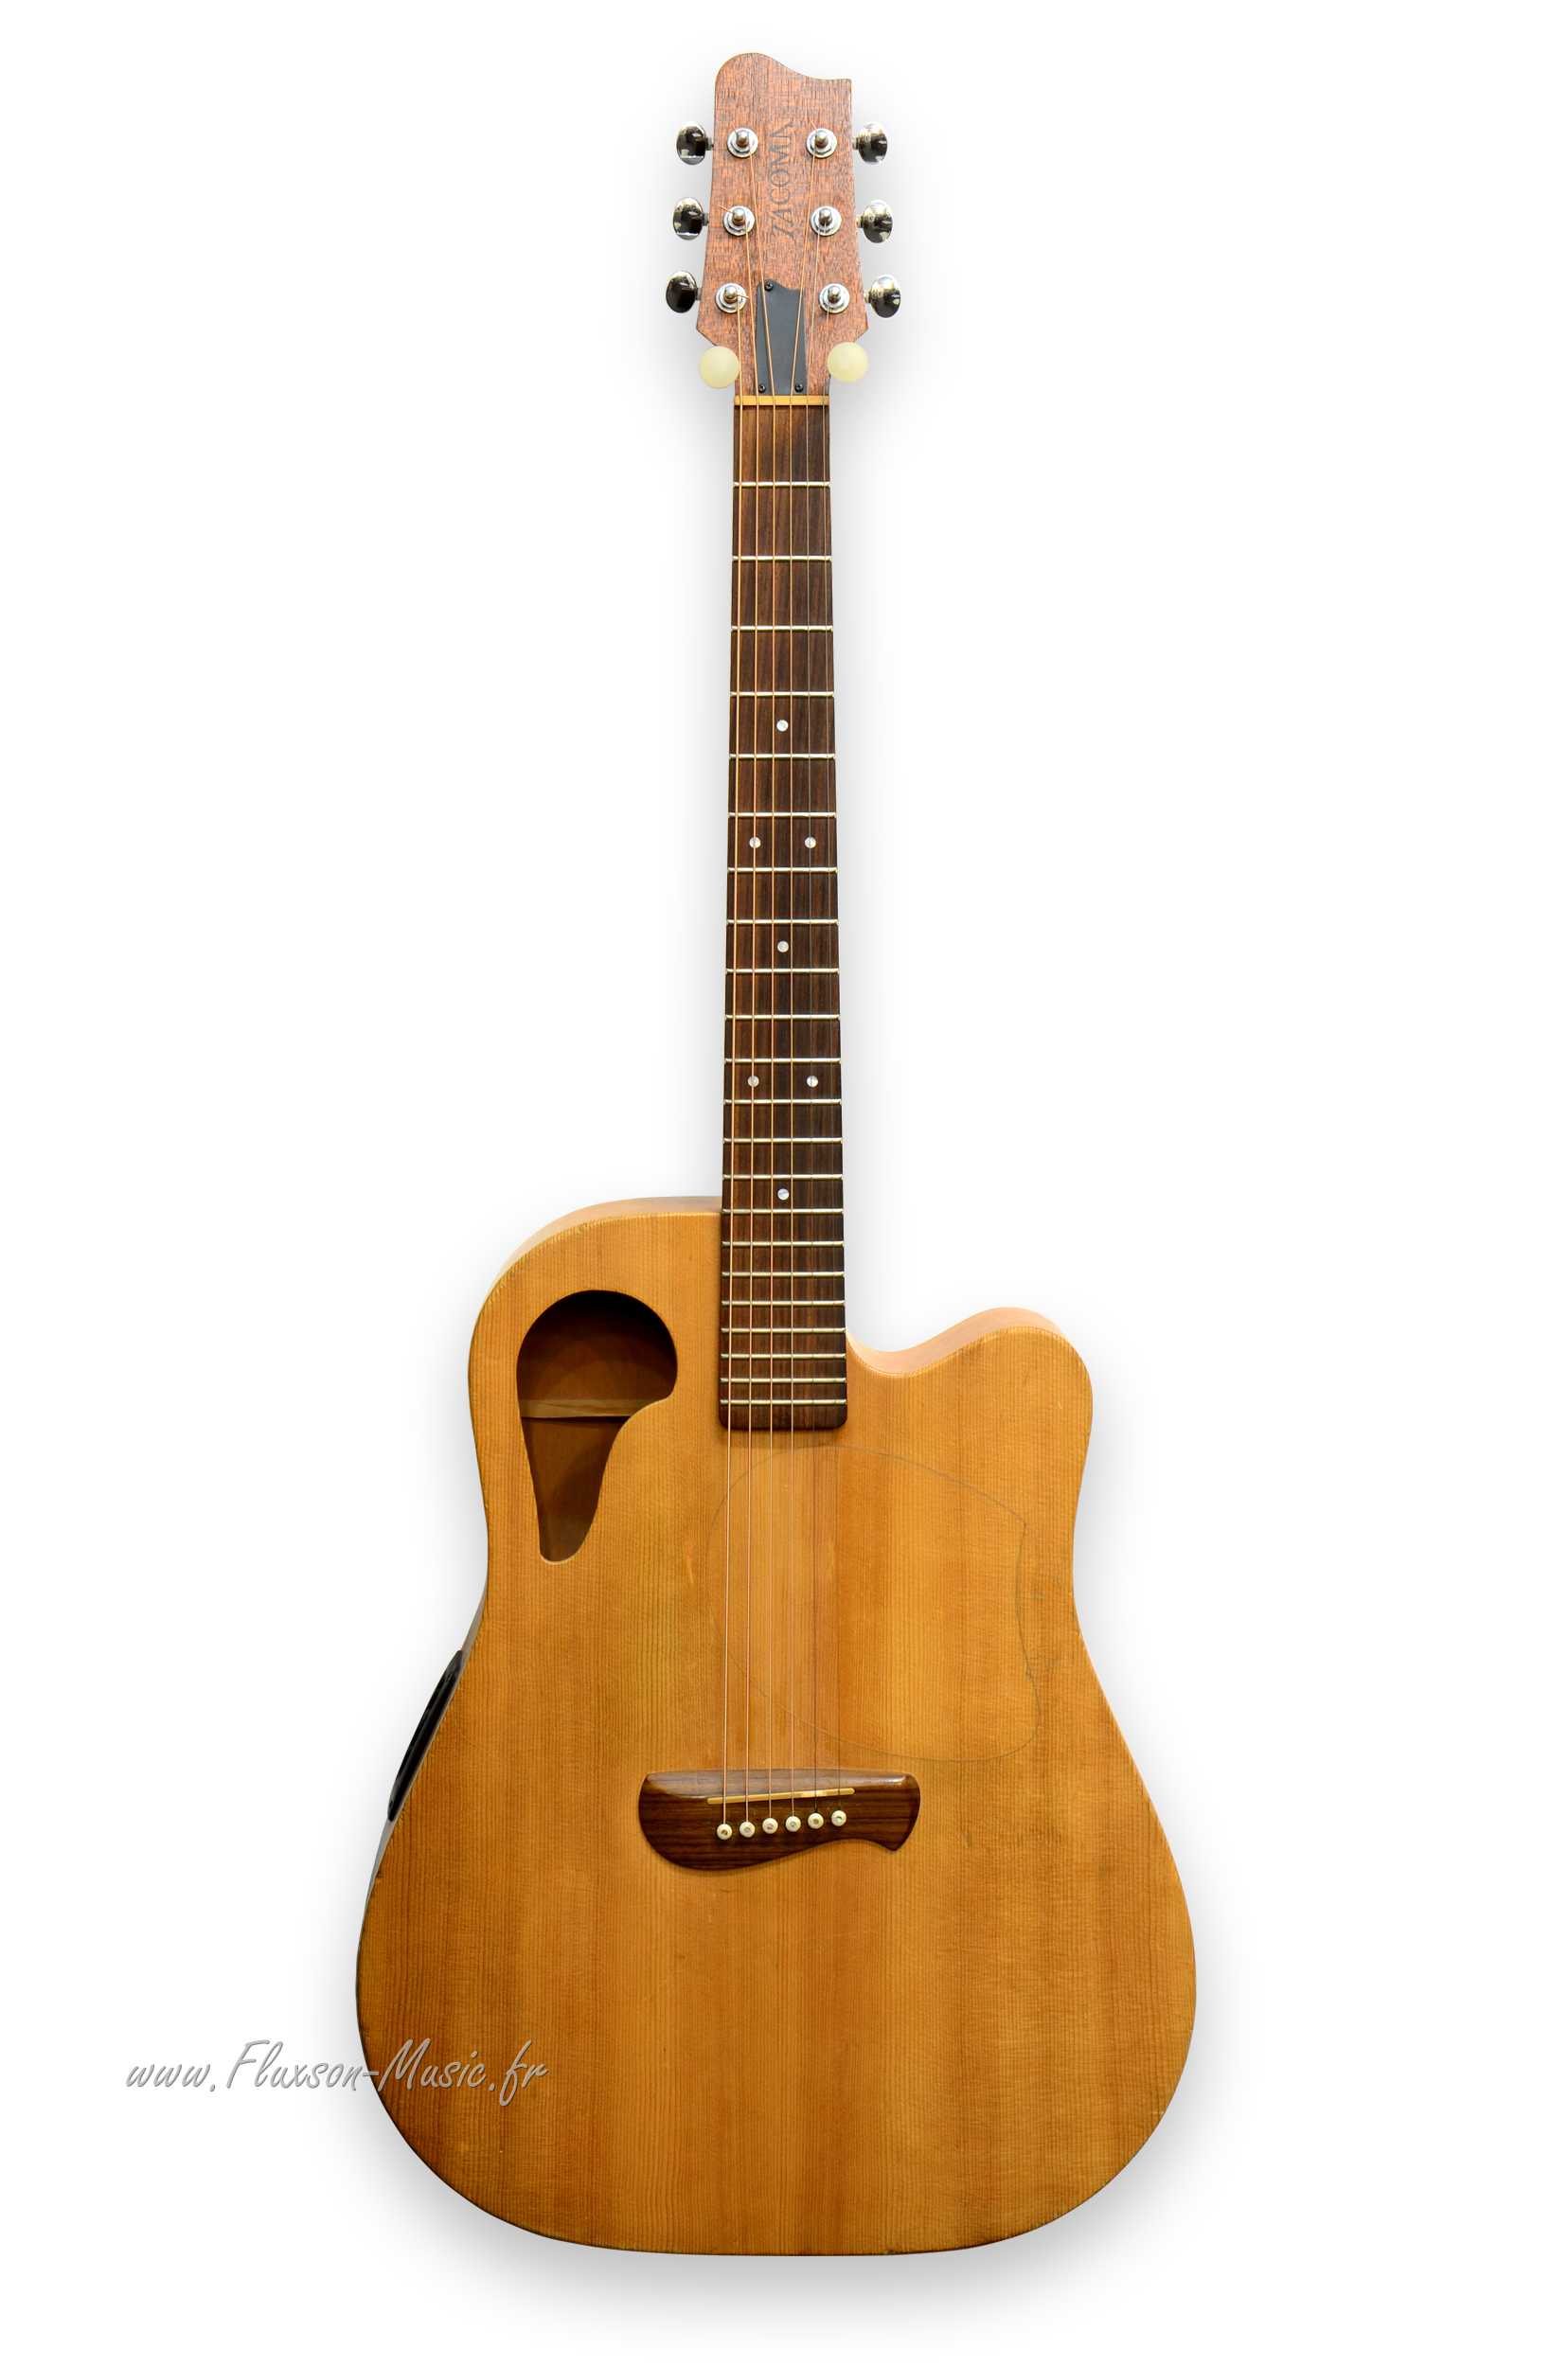 tacoma roadking 1990 natural guitar for sale fluxson music. Black Bedroom Furniture Sets. Home Design Ideas